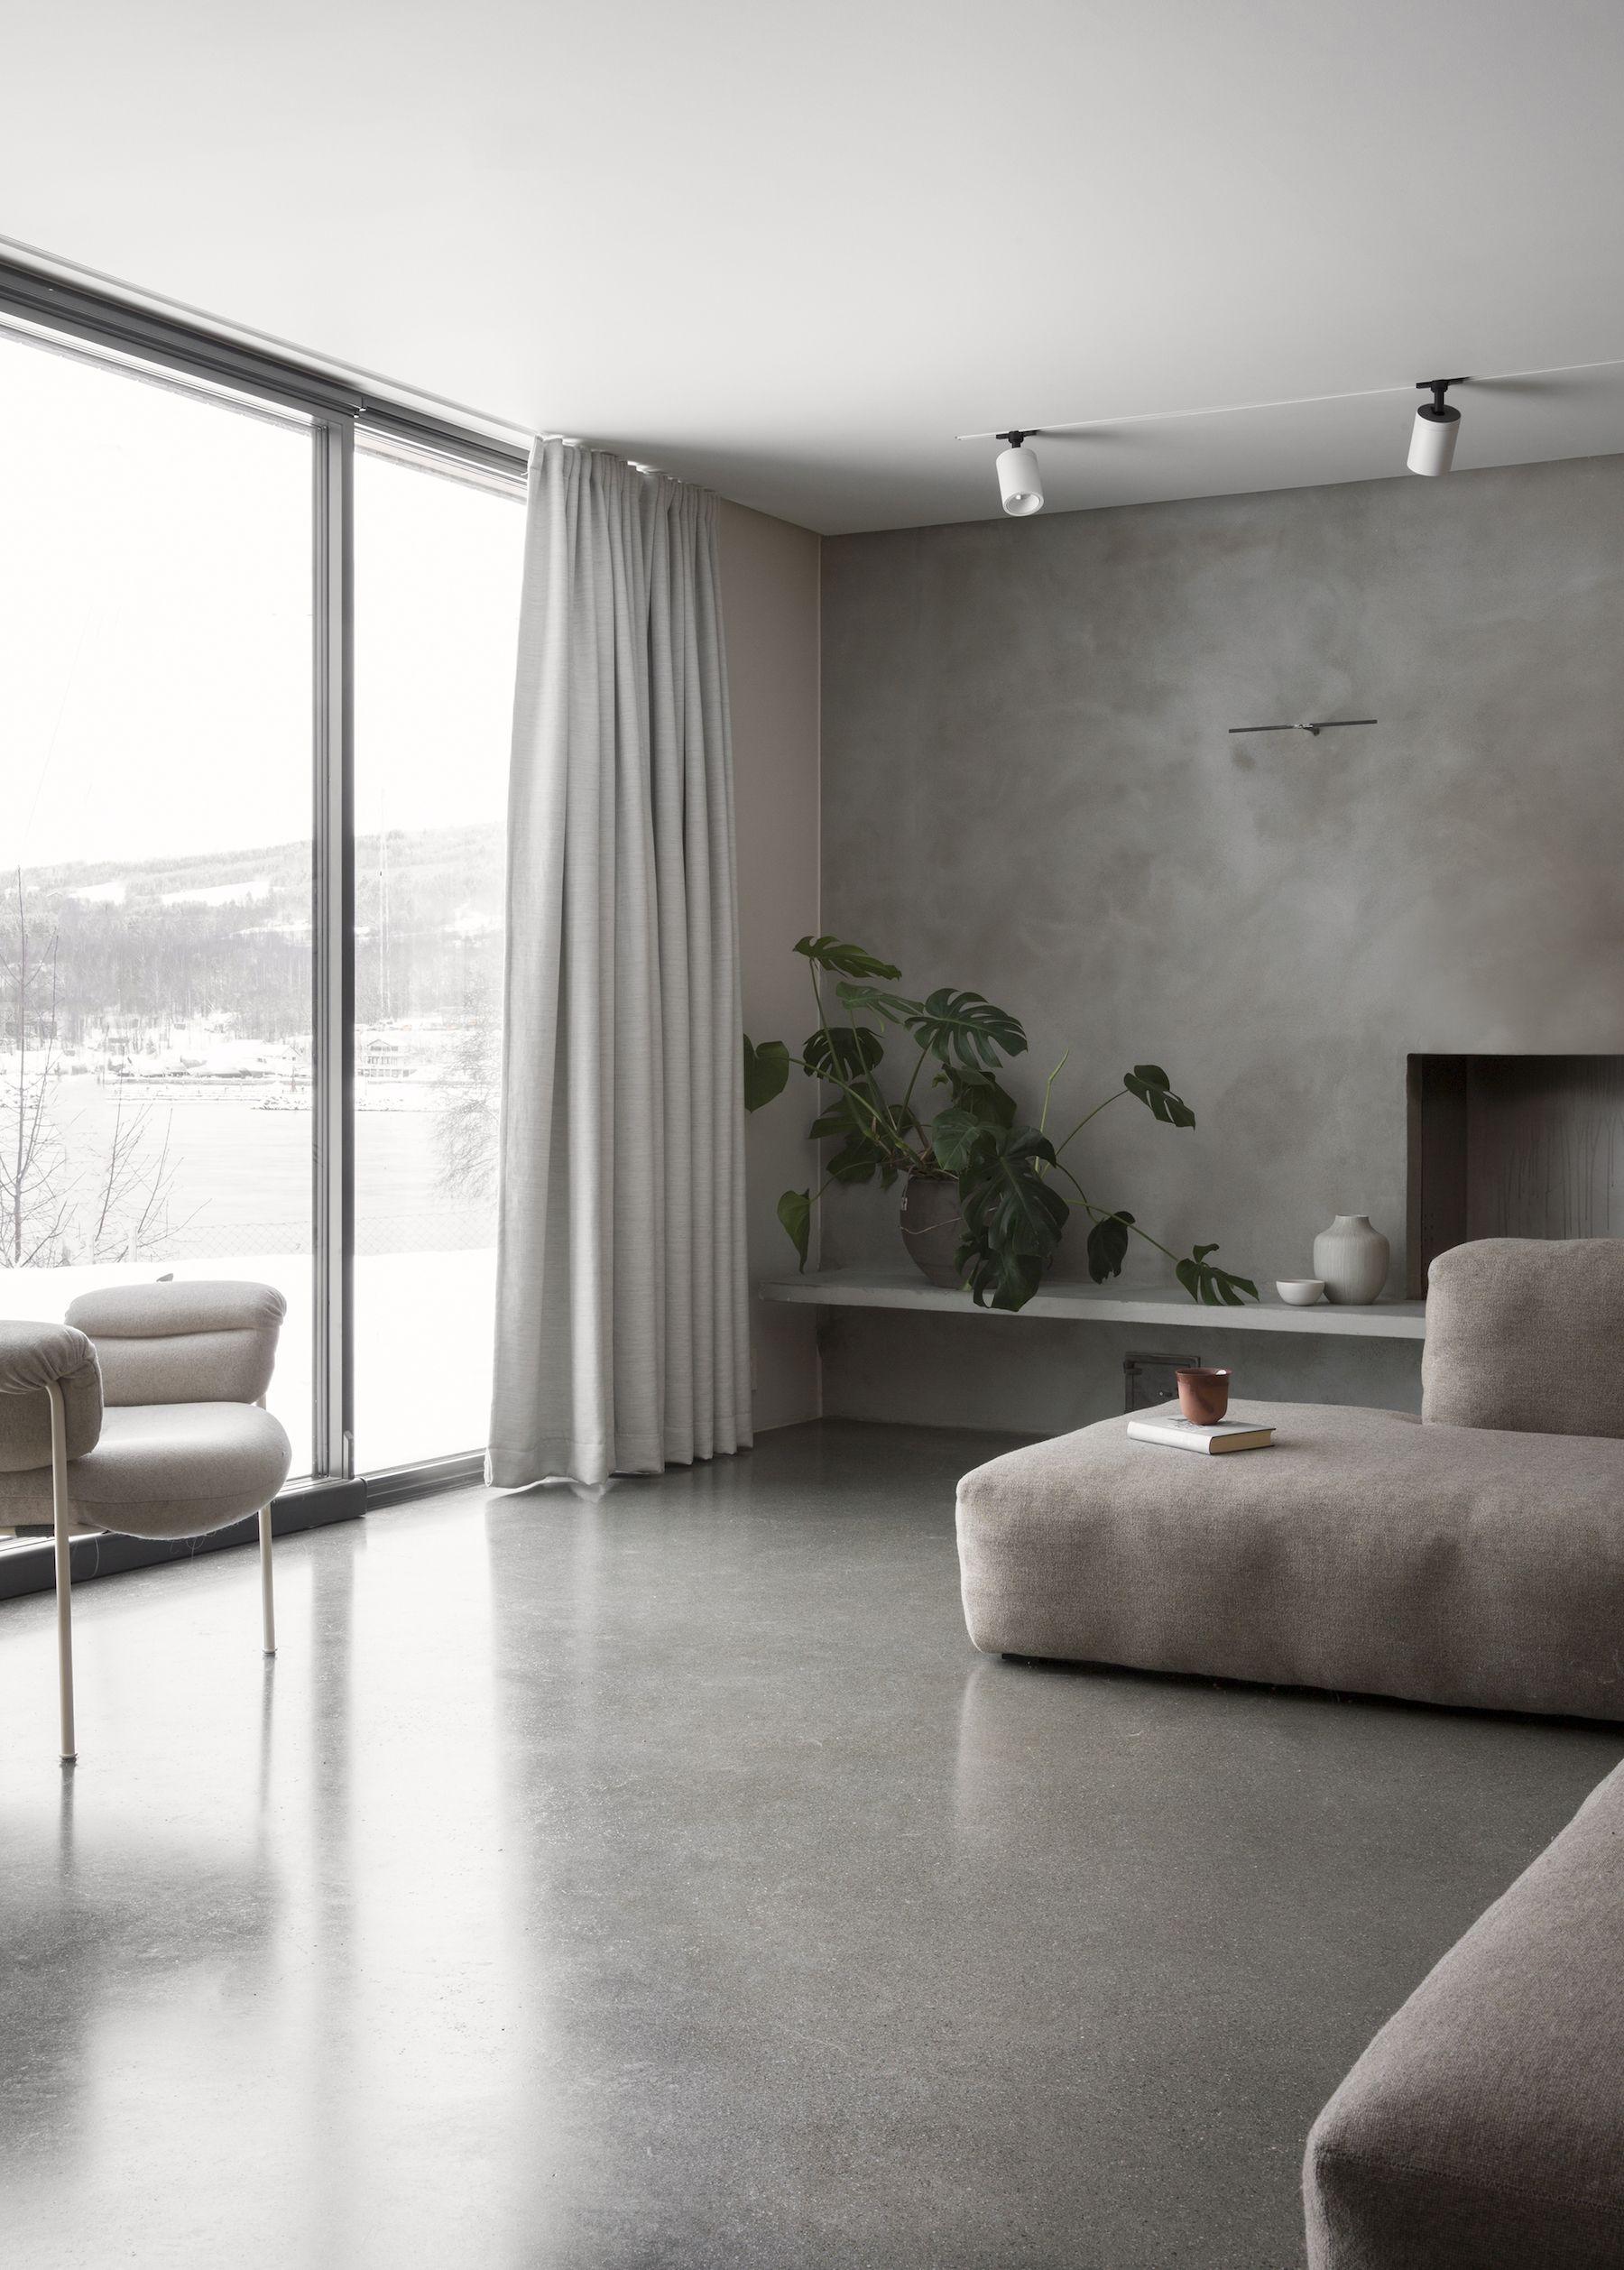 The Gjovik House Minimalist Home